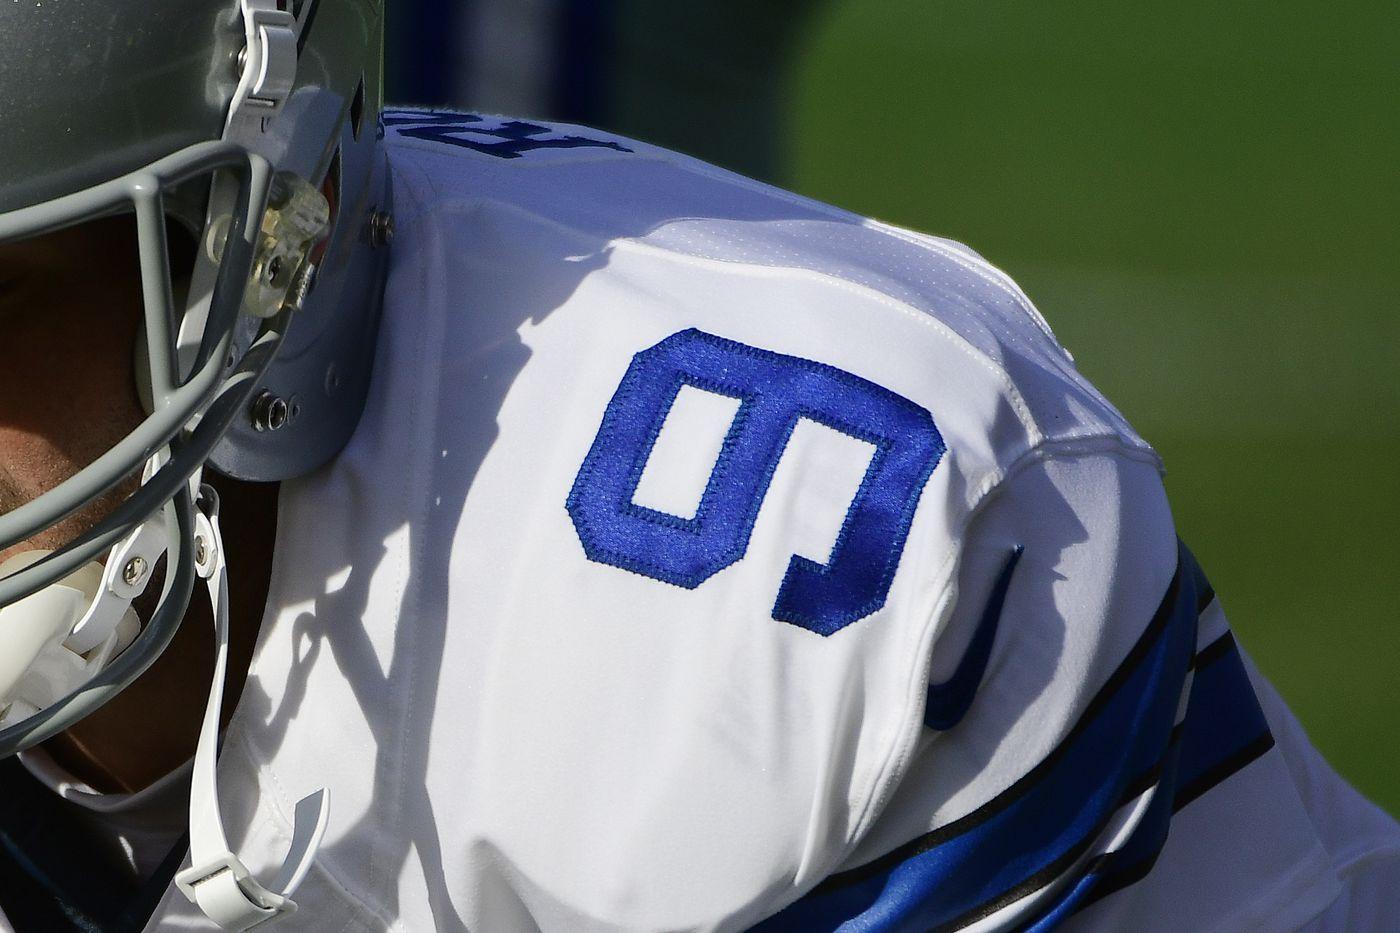 discount cowboys jerseys